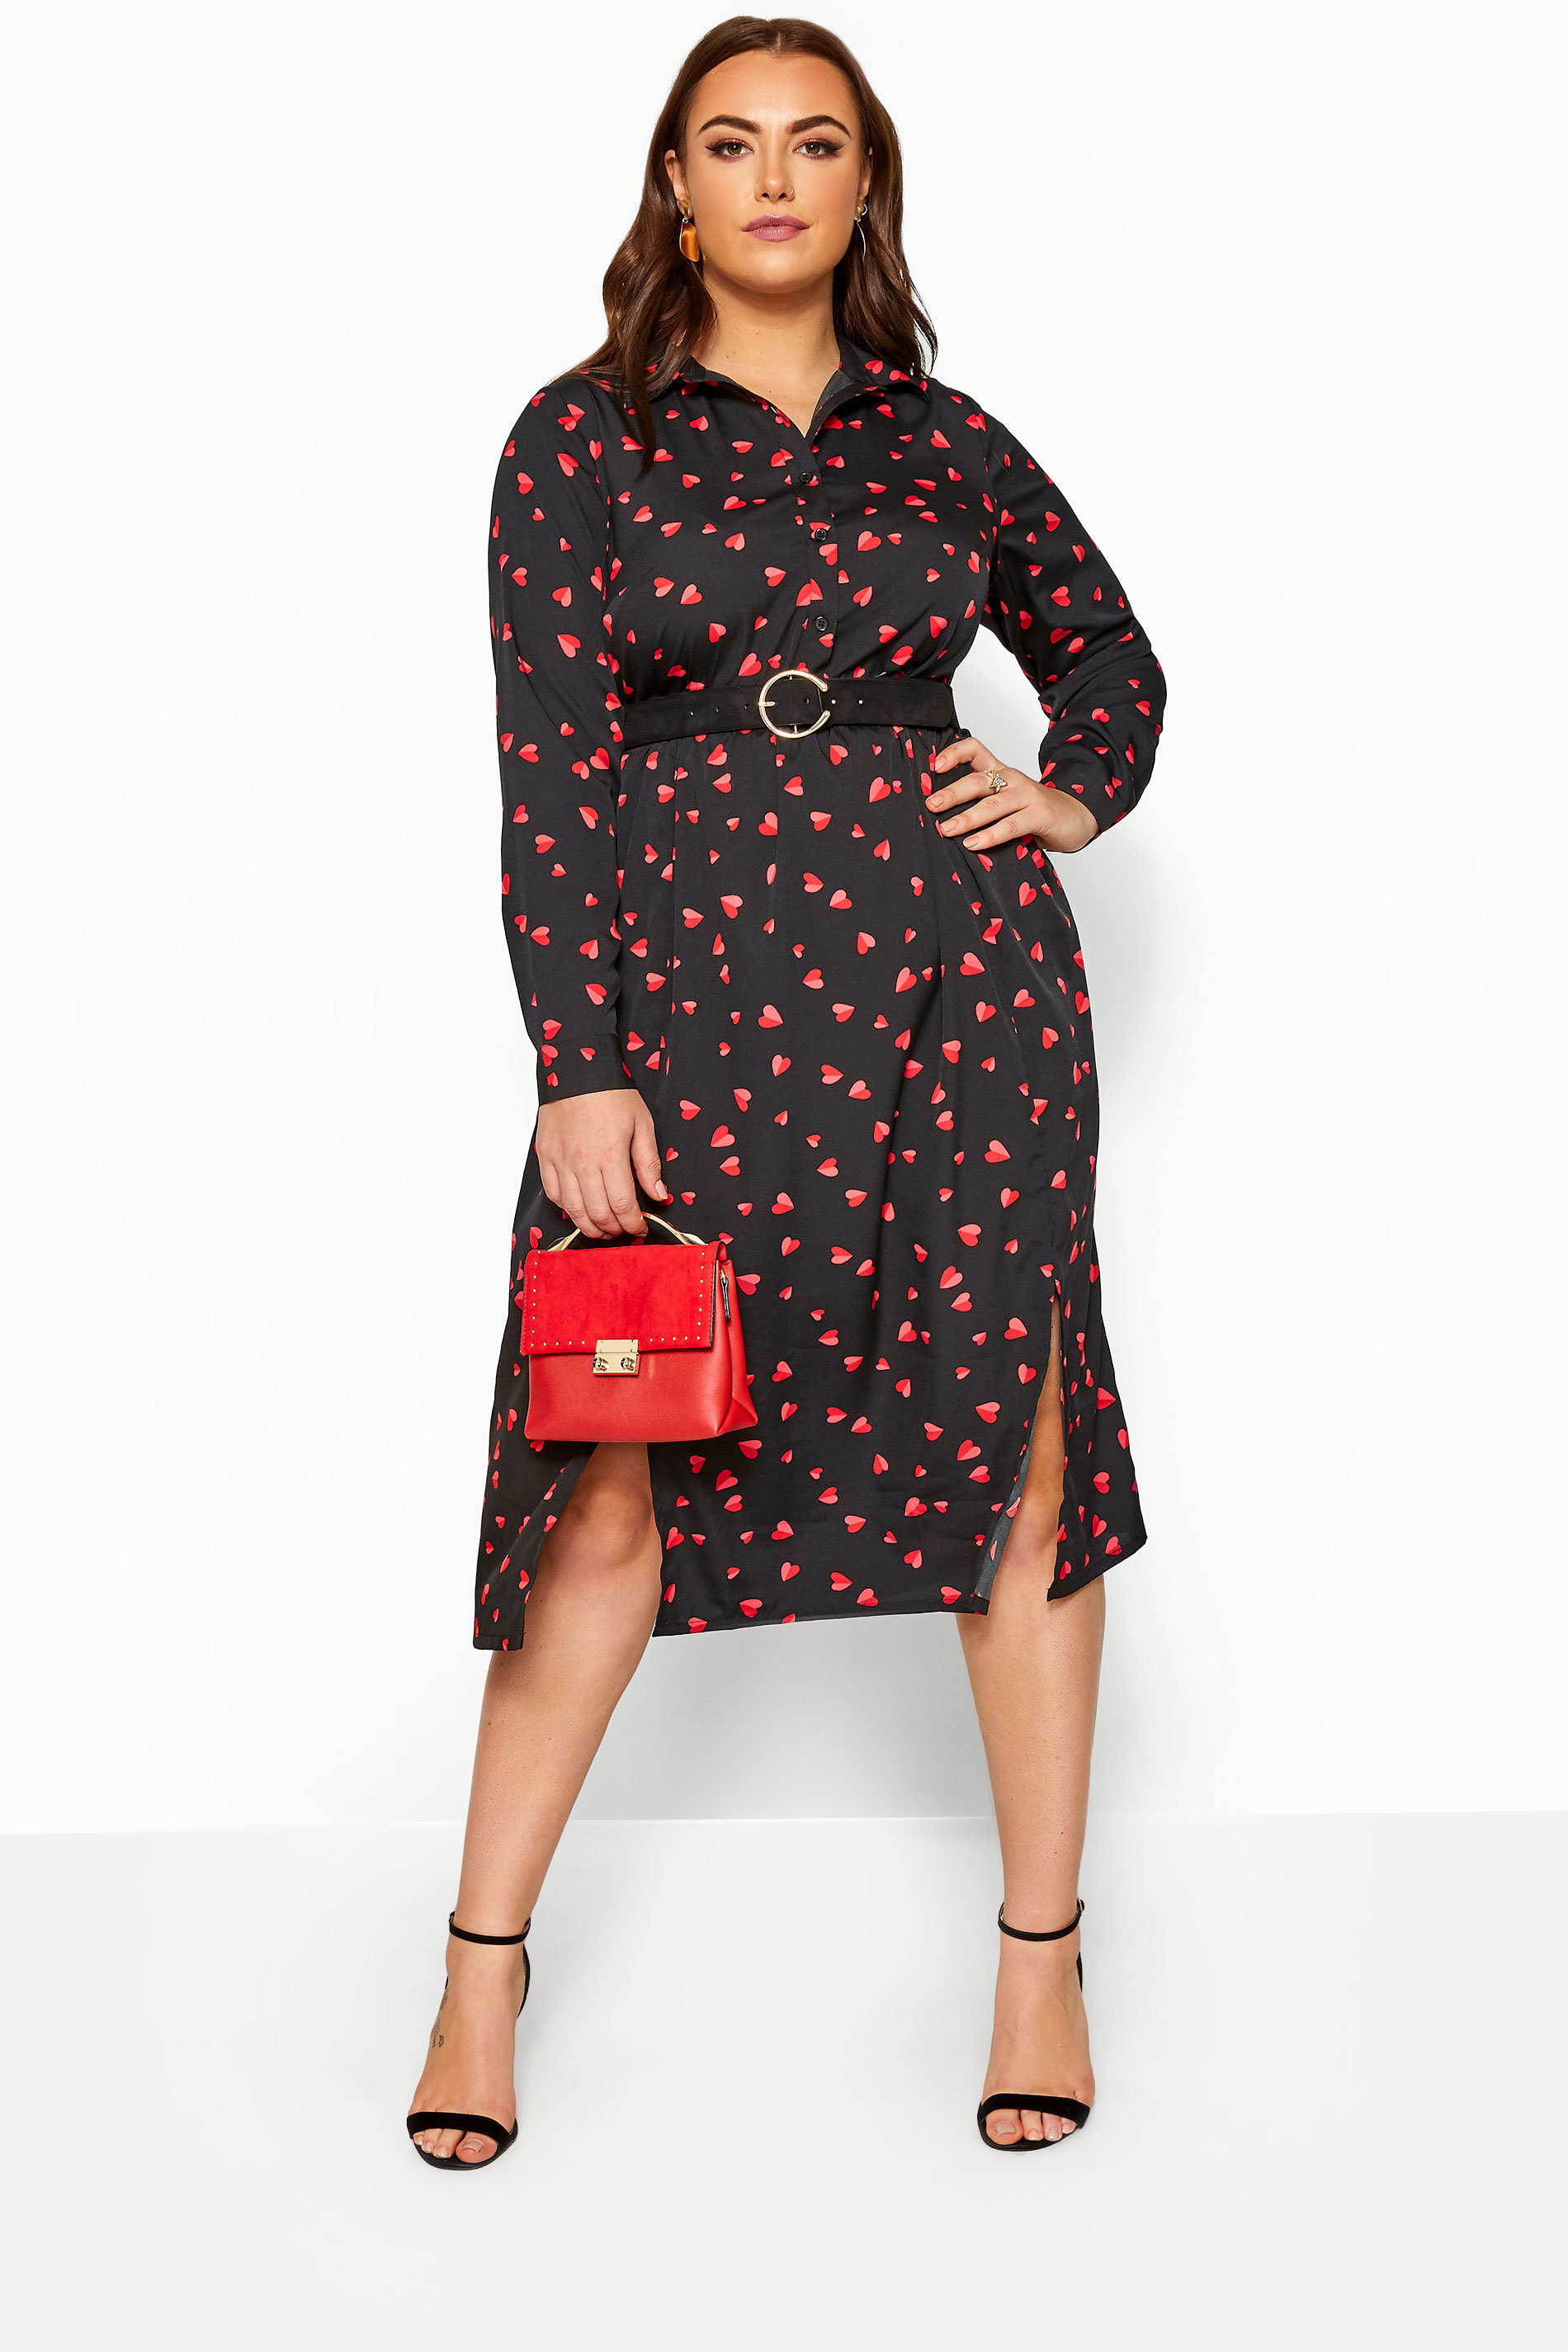 Black Heart Print Shirt Dress